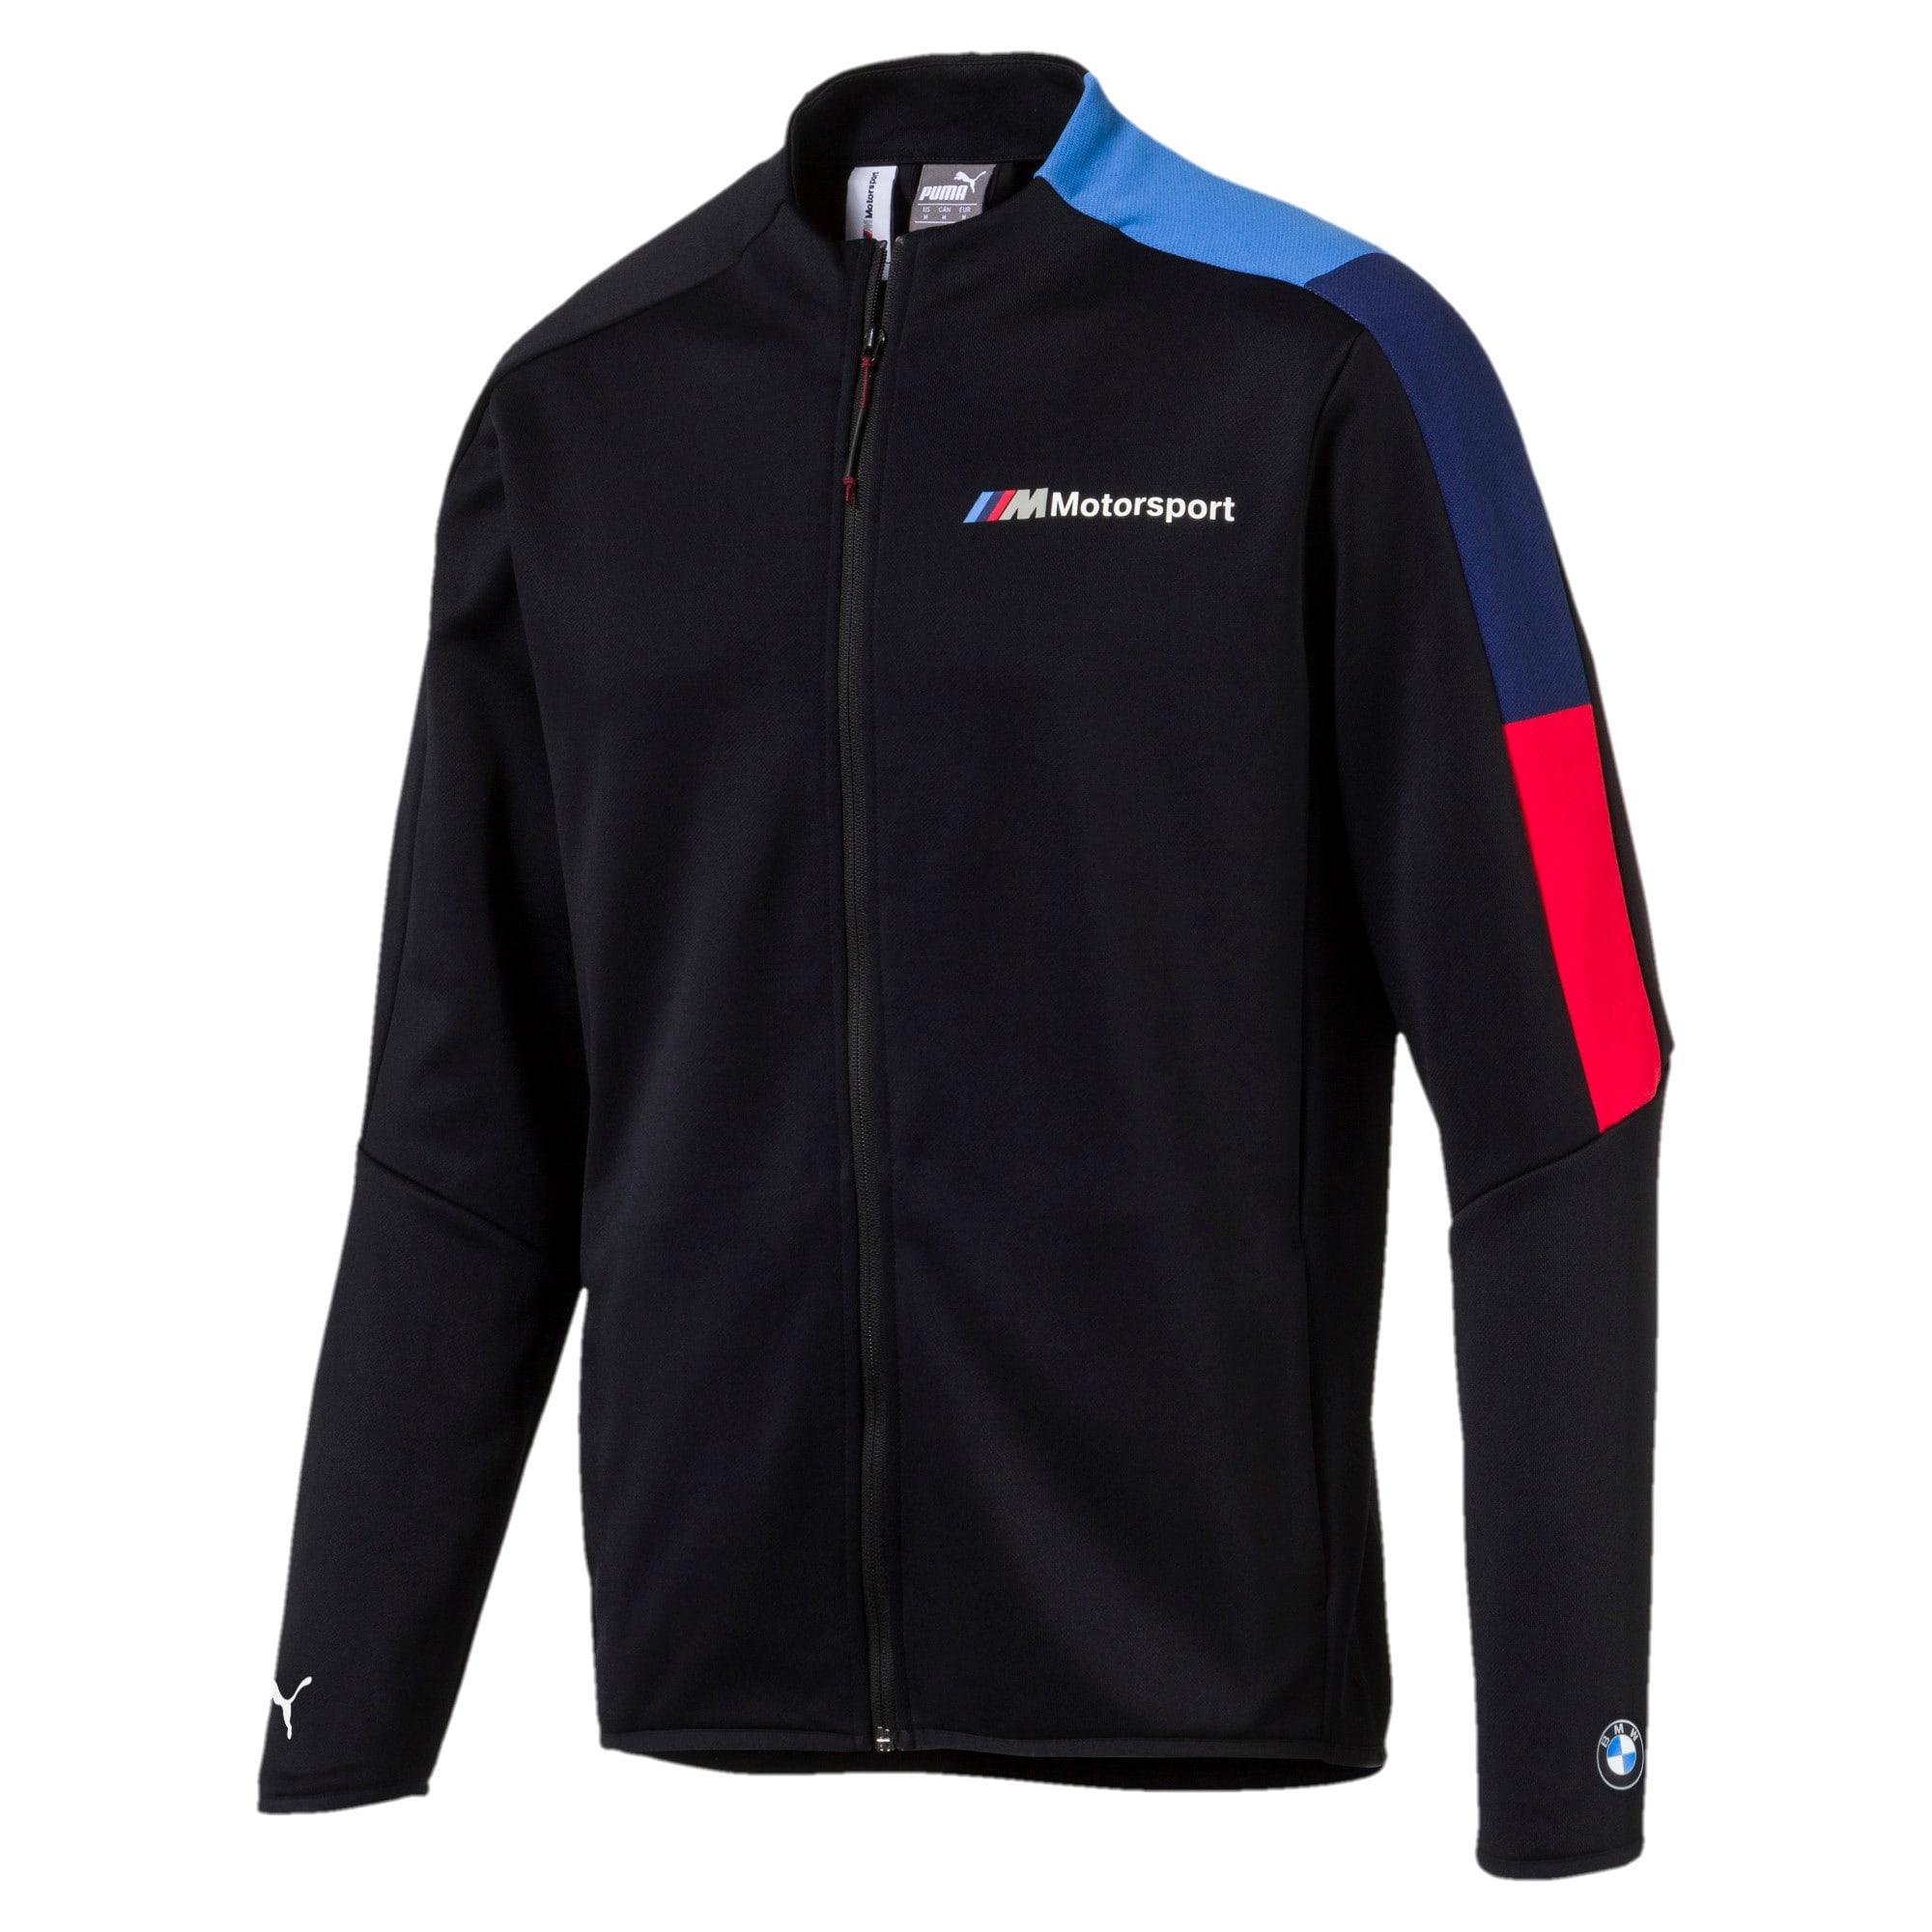 Thumbnail 1 of BMW M Motorsport Men's T7 Track Jacket, Anthracite, medium